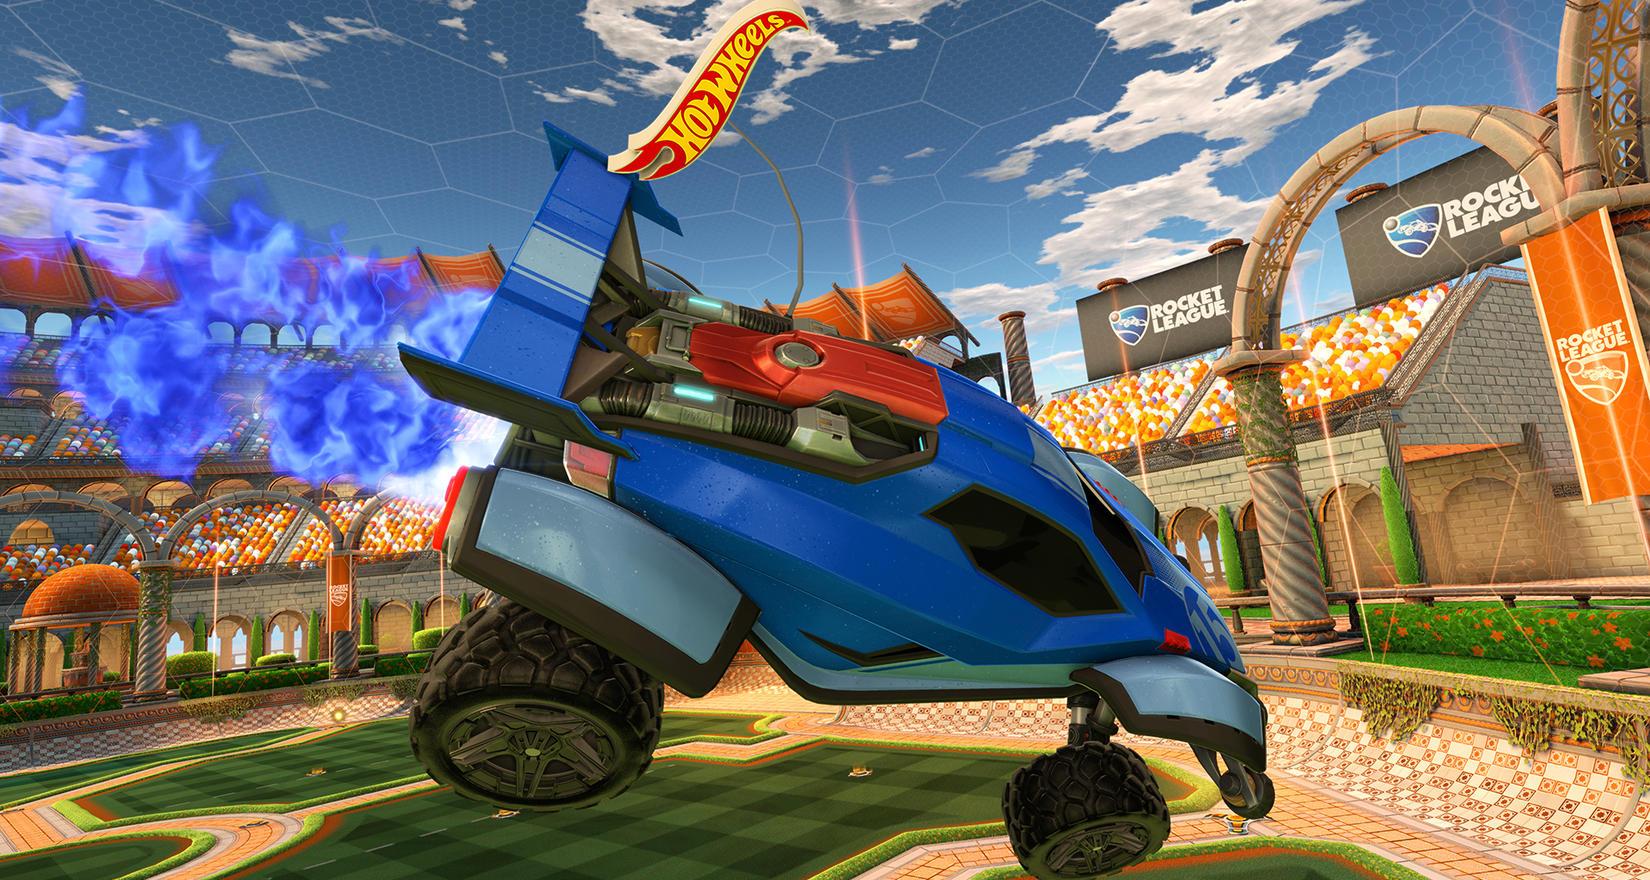 Gute Kombi: Hot Wheels entwickelt Rocket League RC-Autos